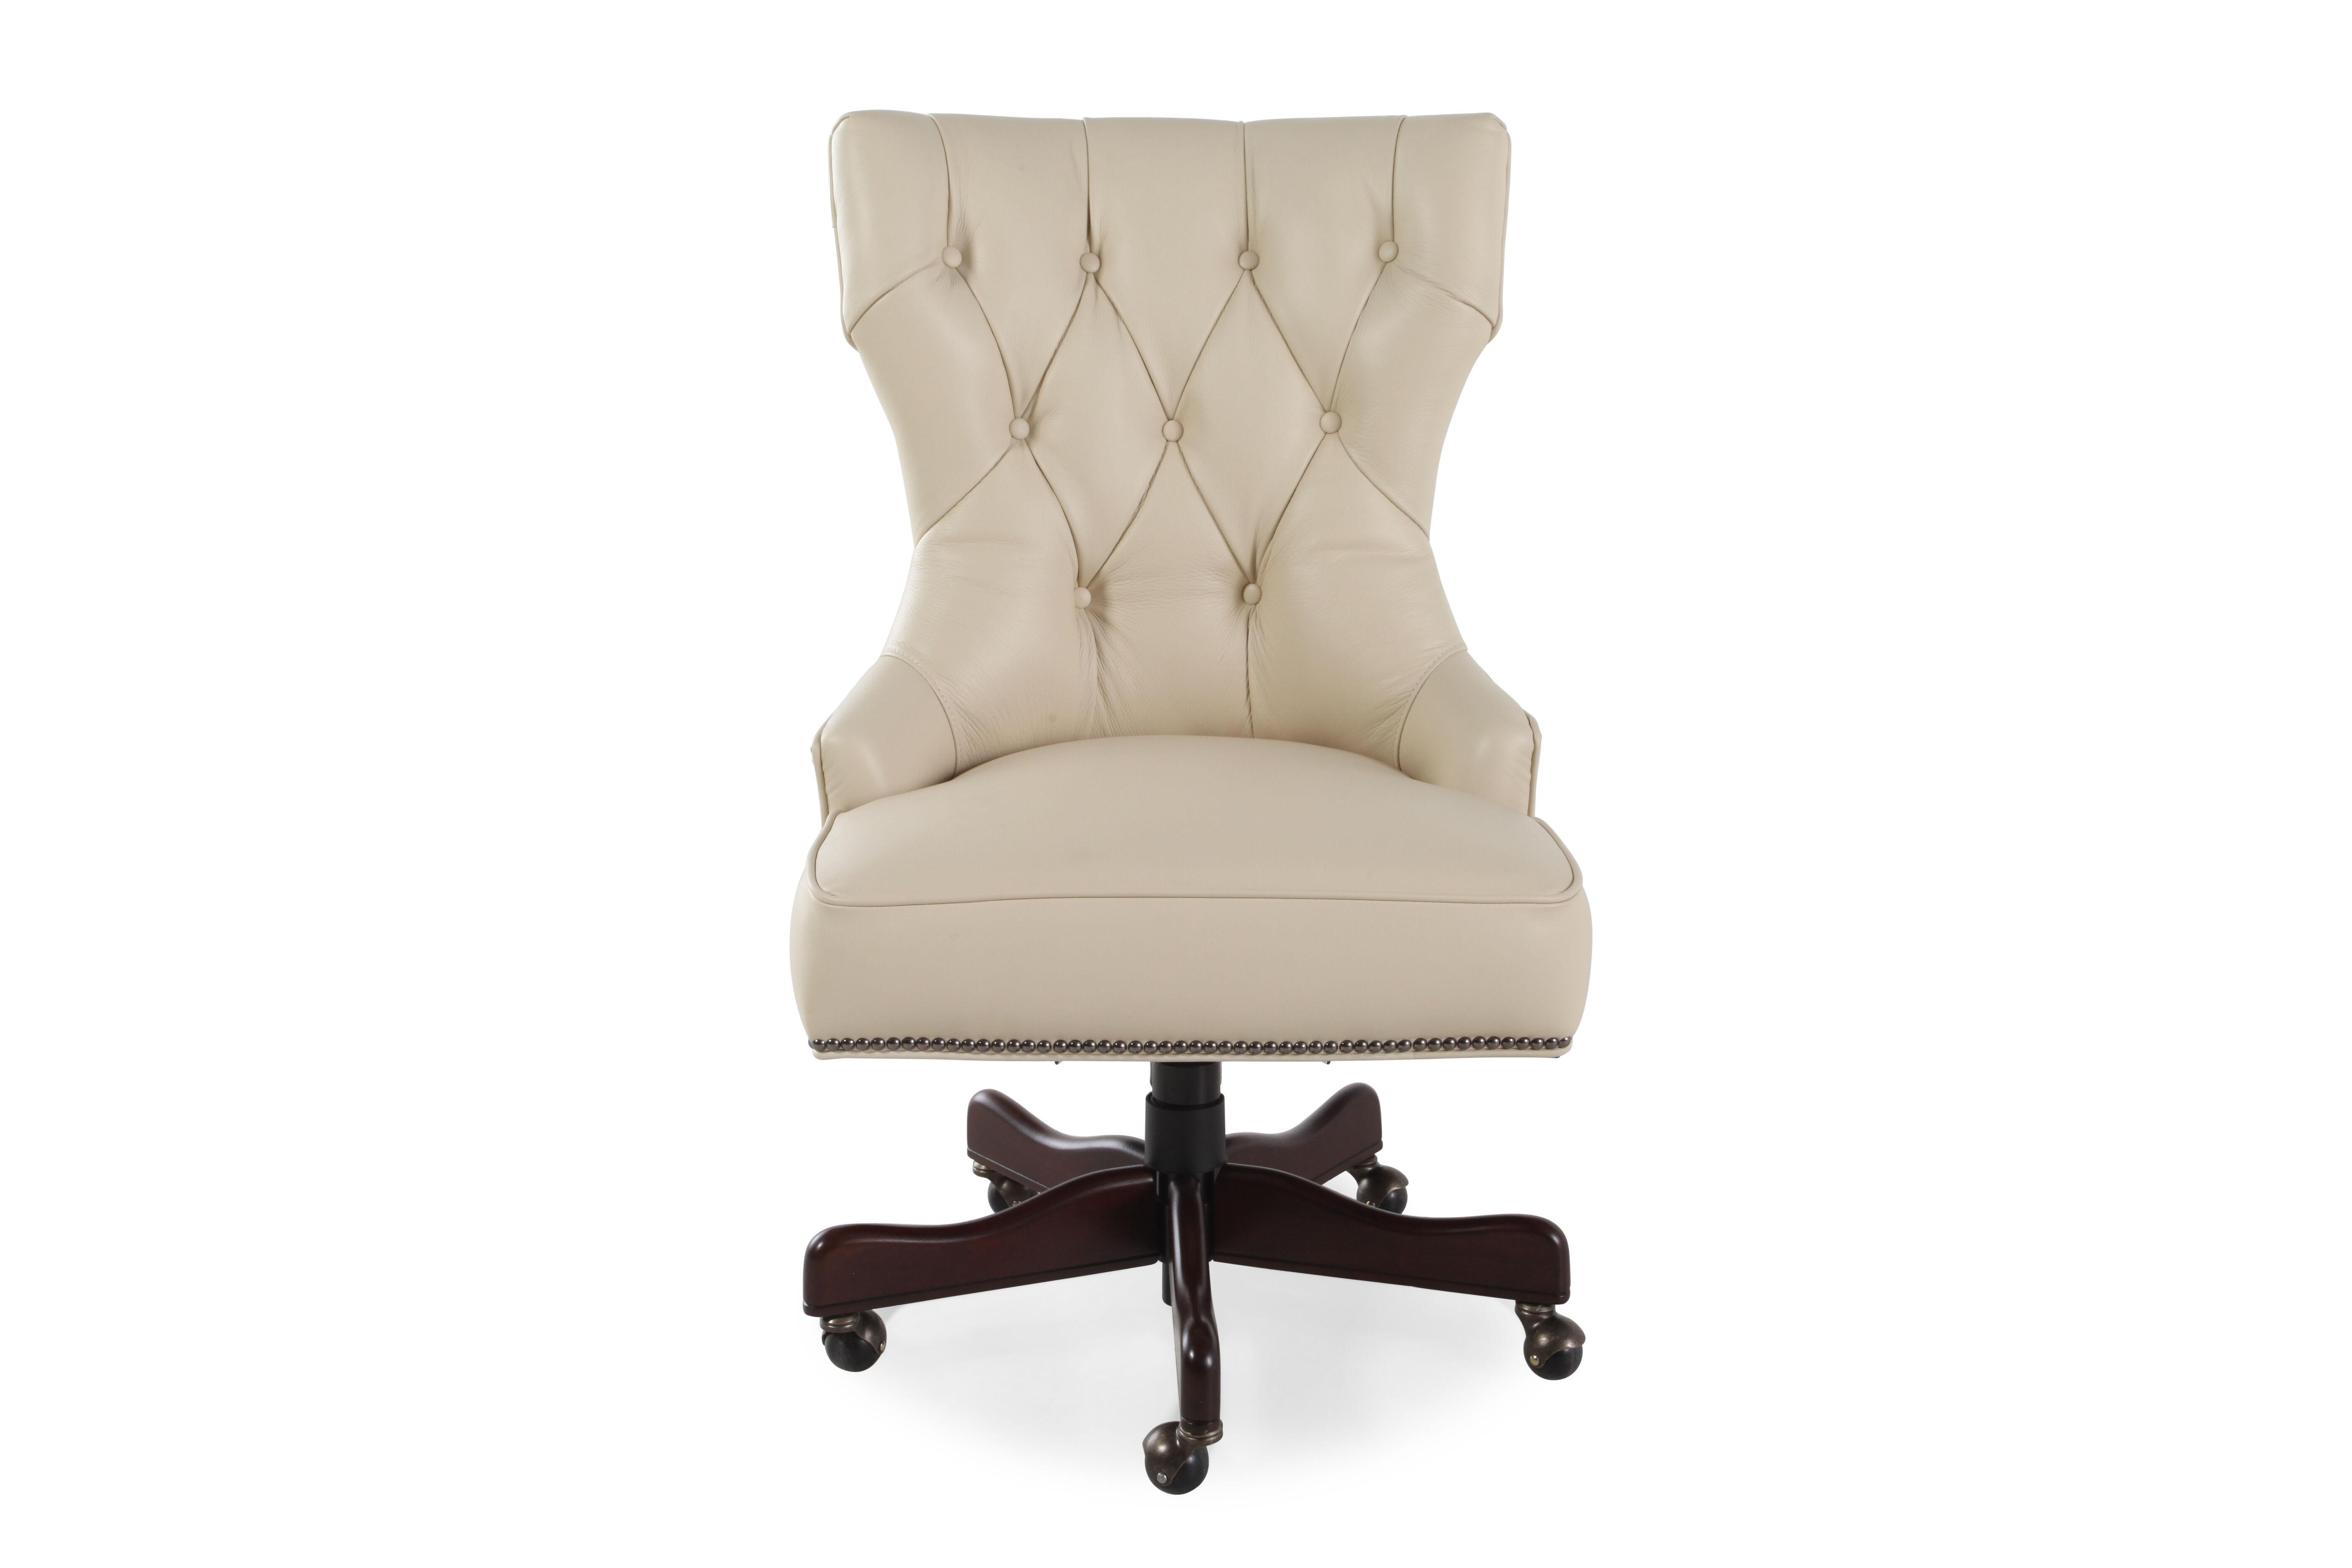 Captivating Leather Button Tufted Swivel Tilt Desk Chairu0026nbsp;in Ivory Leather  Button Tufted Swivel Tilt Desk Chairu0026nbsp;in Ivory